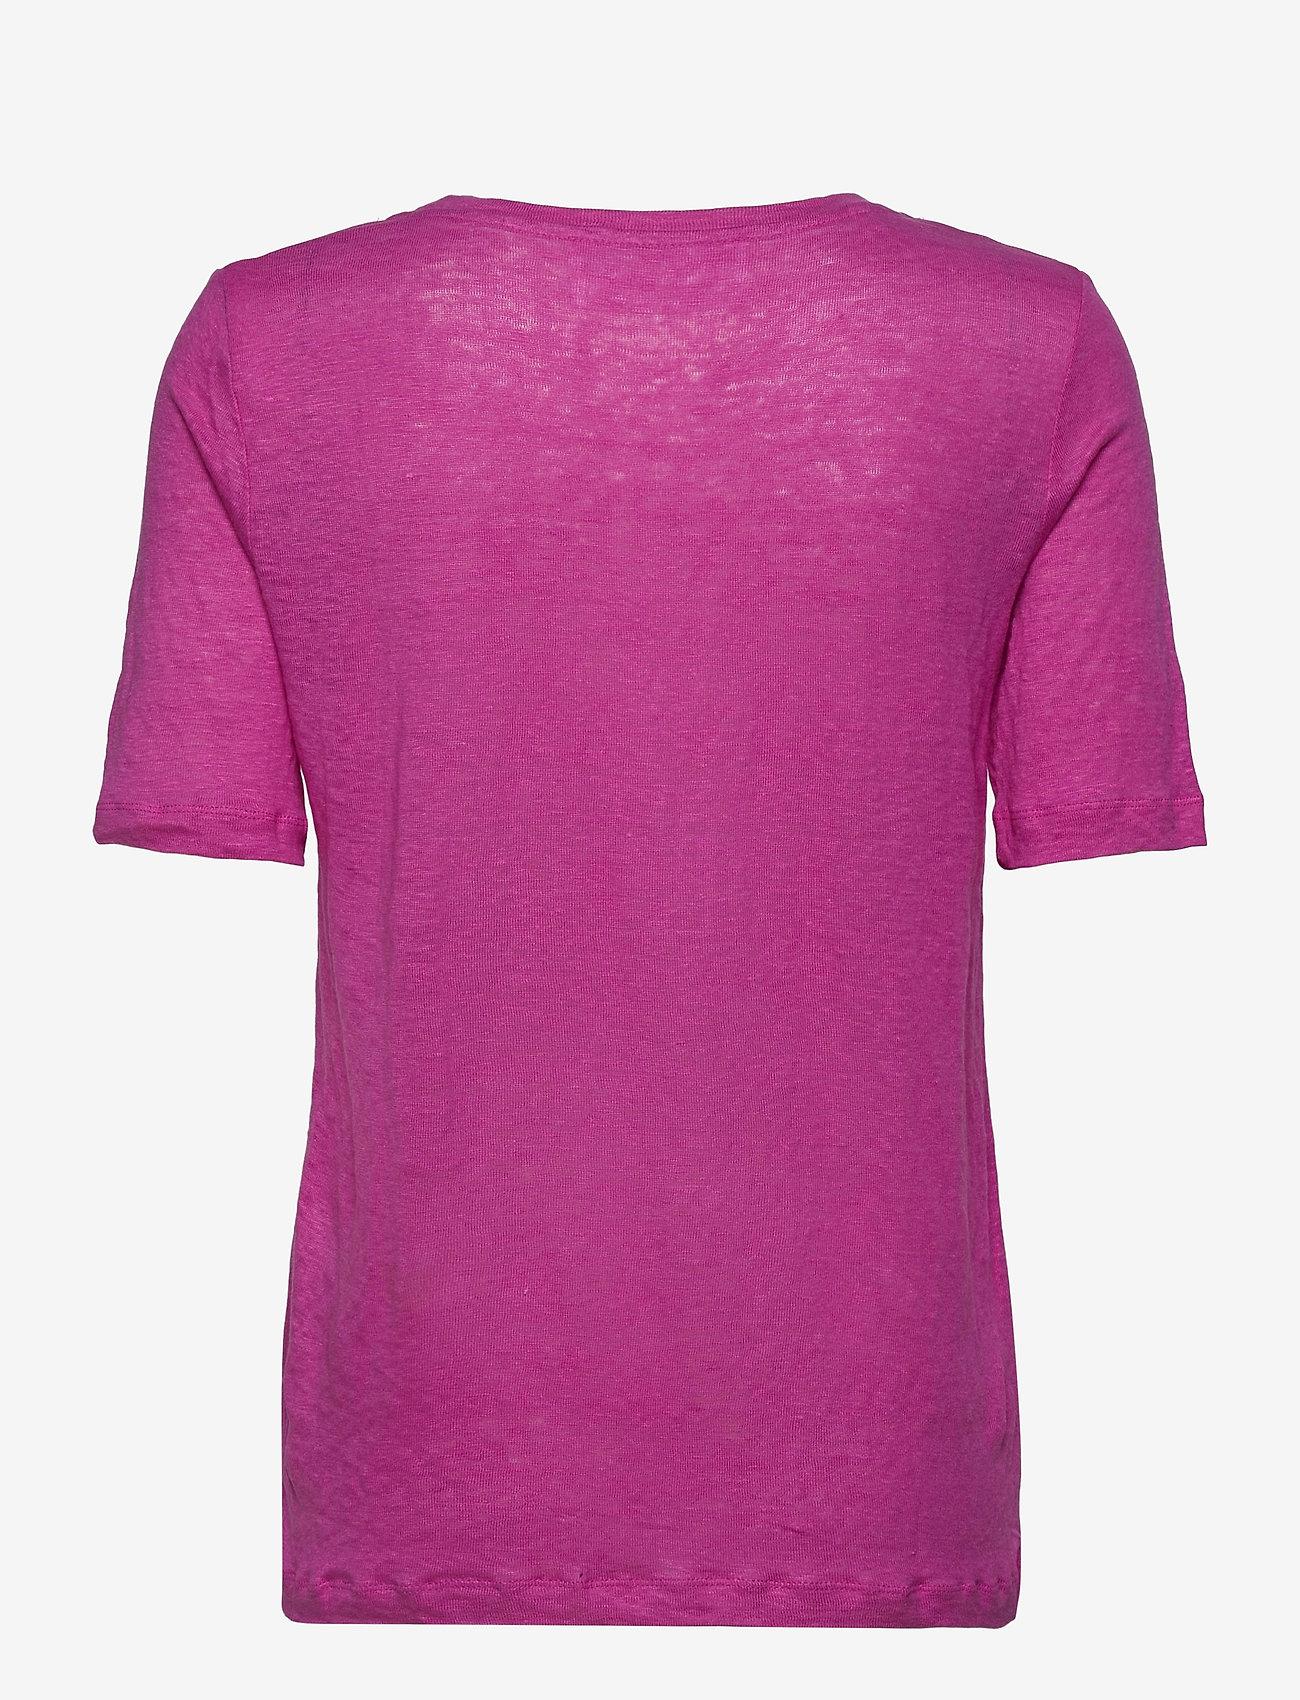 Selected Femme - SLFLINEN SS U-NECK TEE - t-shirts - rose violet - 1